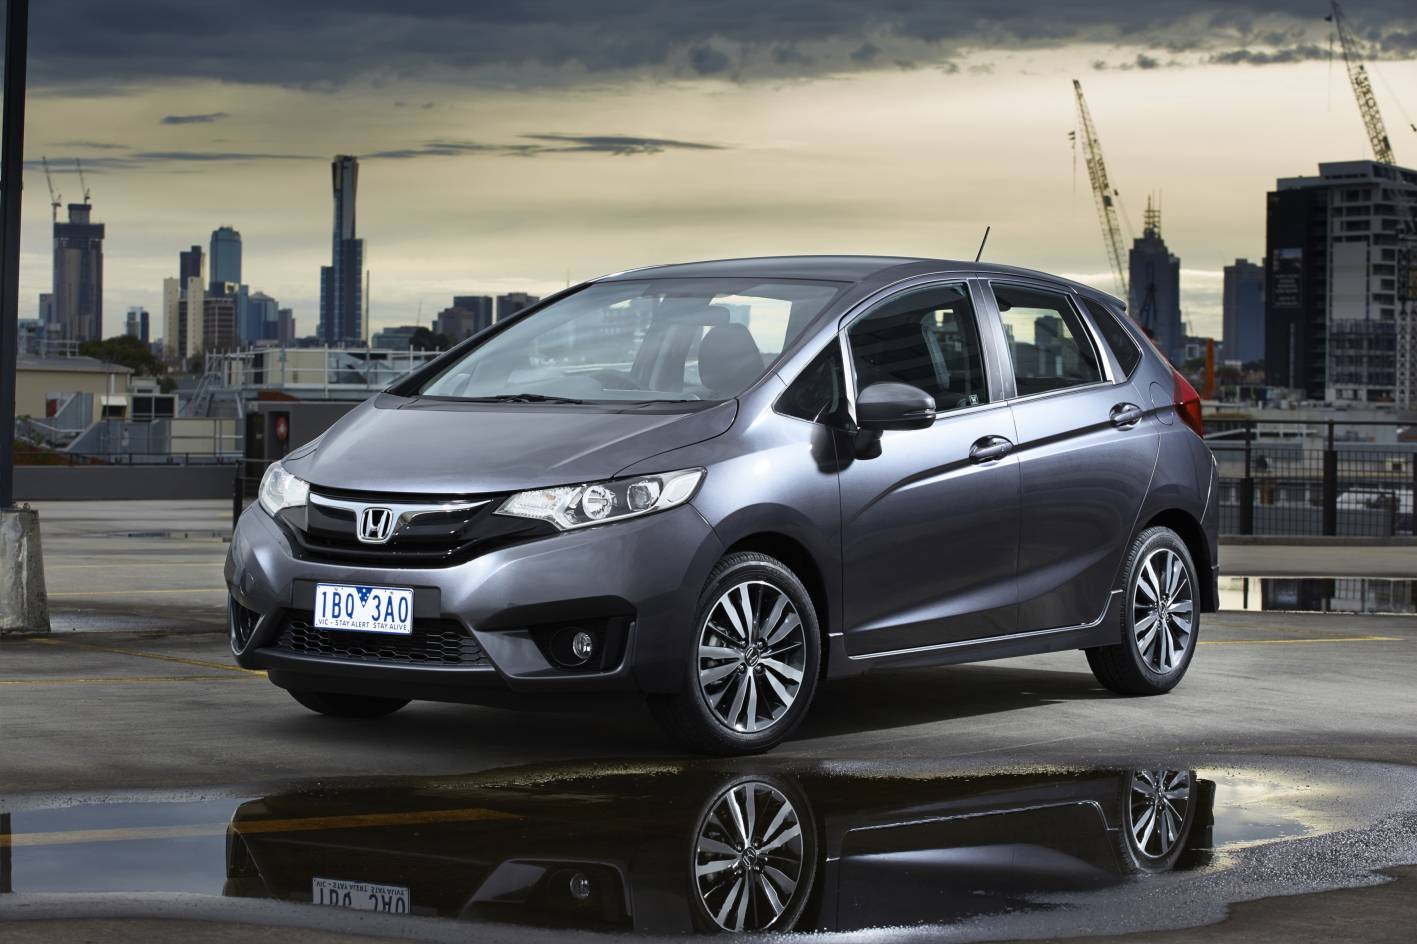 2014 Honda Jazz Price 2015 Honda Jazz Fit Price .html ...